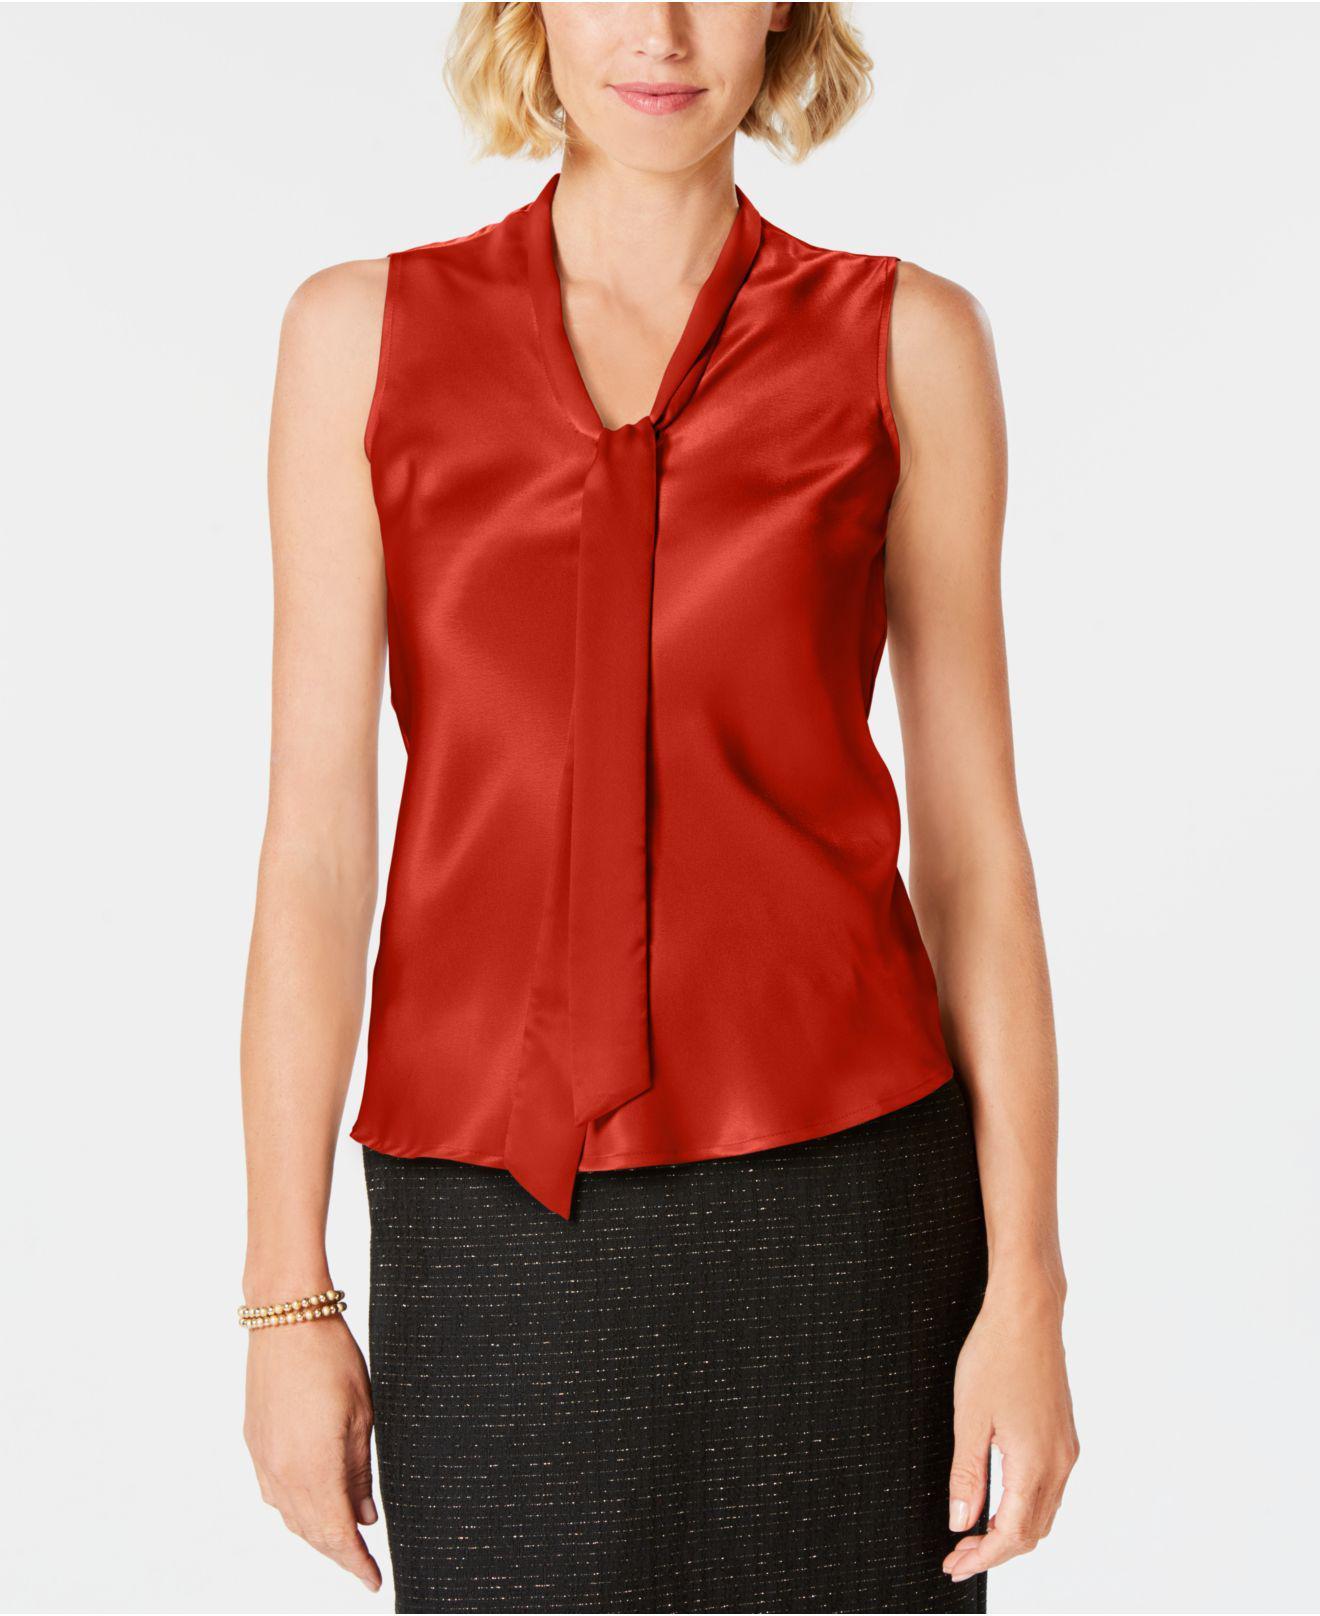 ed789ac0574e7 Lyst - Kasper Tie-neck Sleeveless Blouse in Red